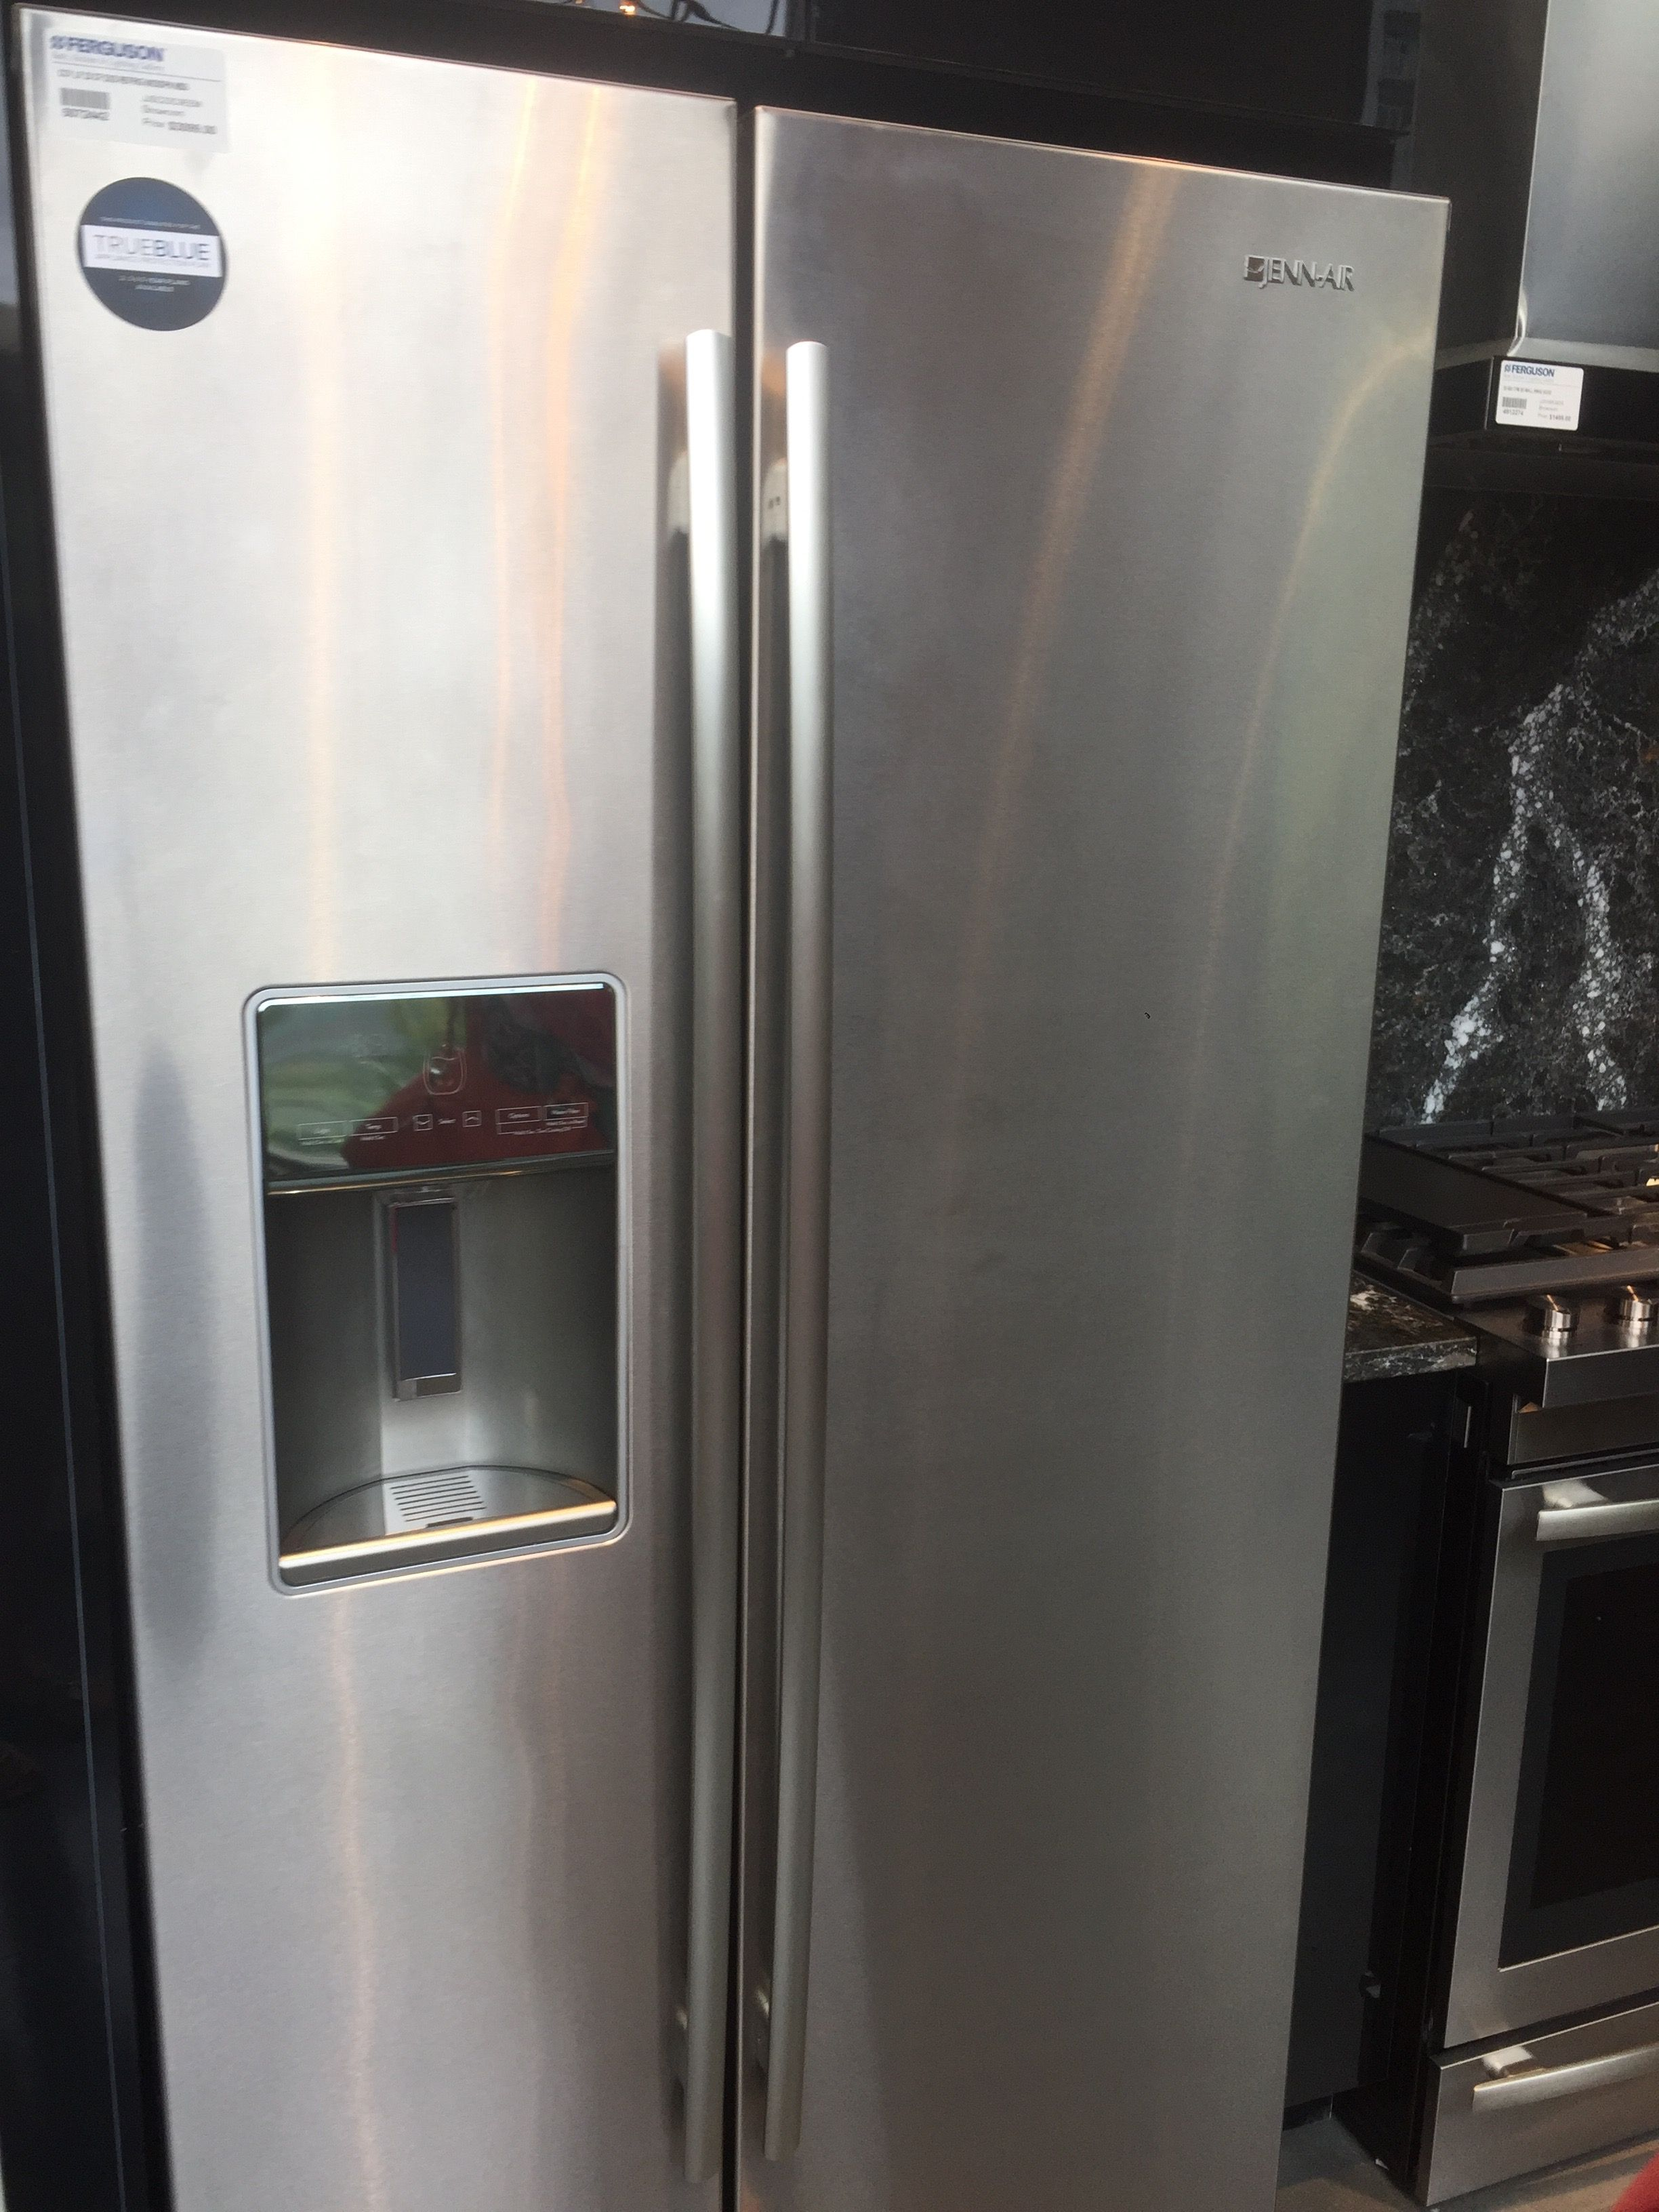 JennAir Refrigerator nice, lightweight open Eastover